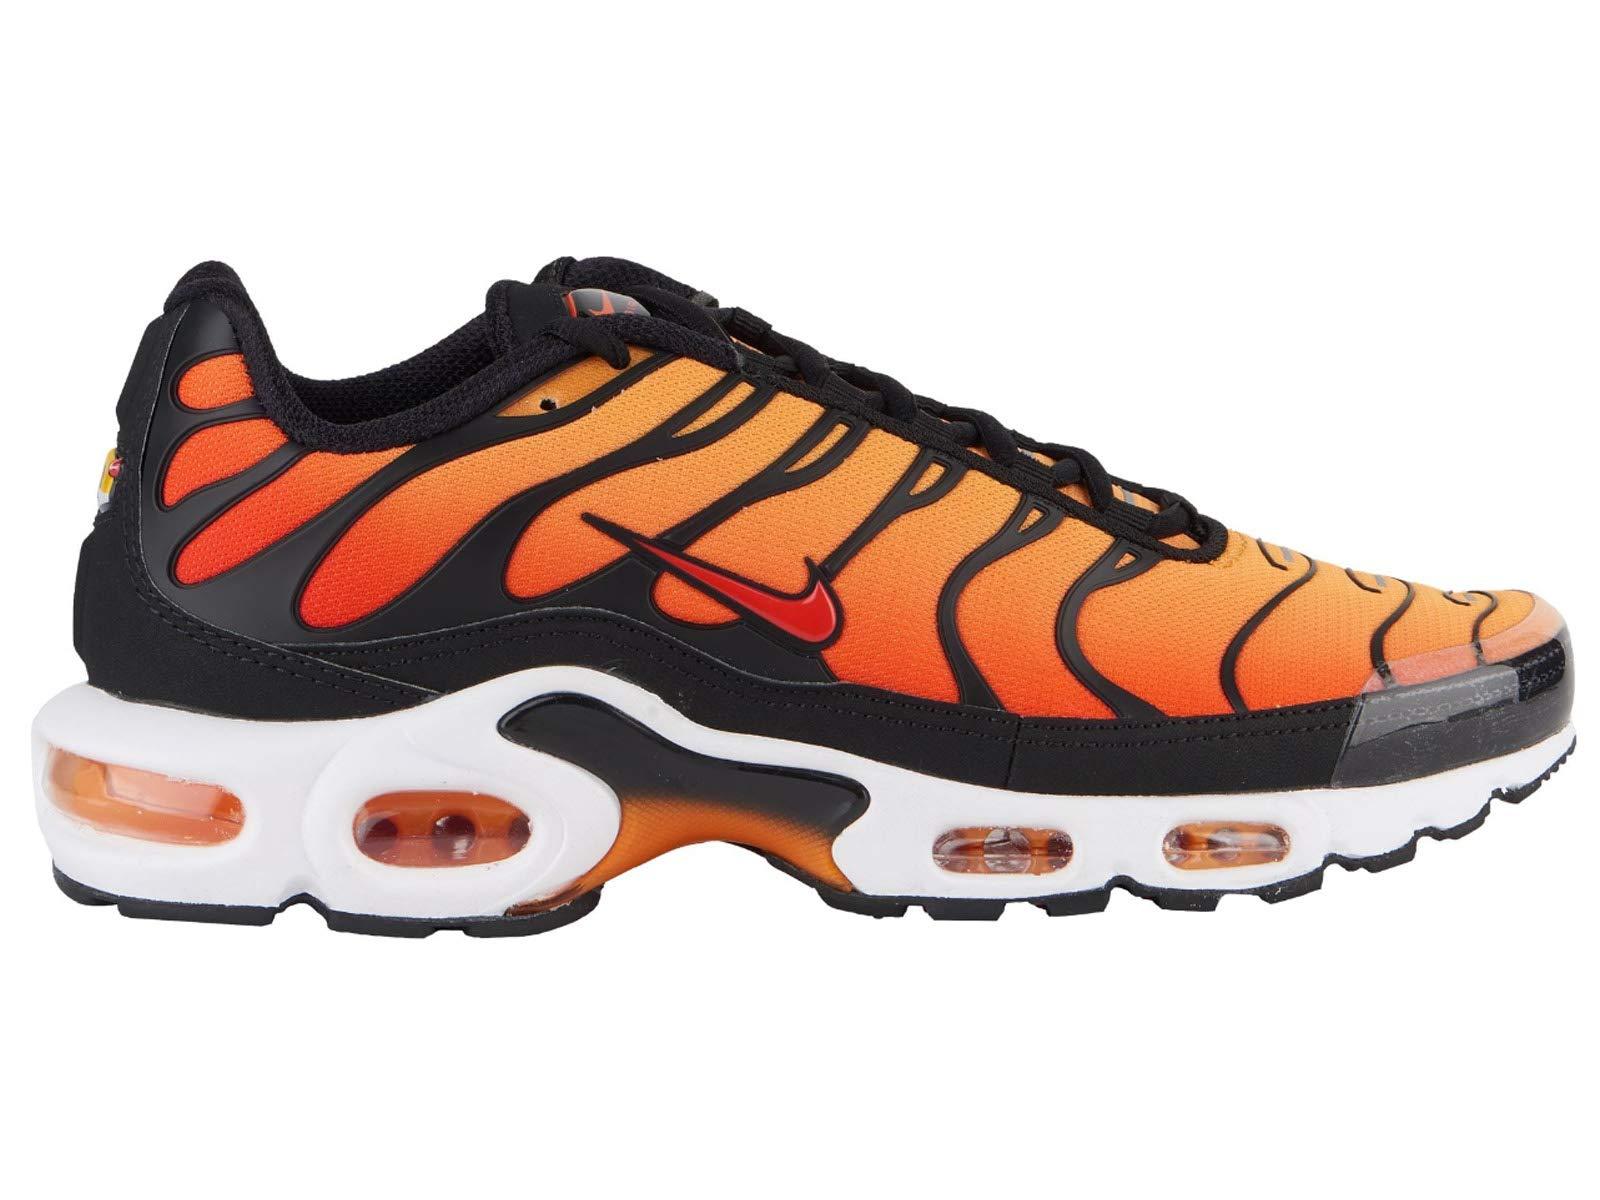 pretty nice f3668 9a51e Nike Men s Air Max Plus Black Pimento Bright Ceramic Resin Mesh Running  Shoes